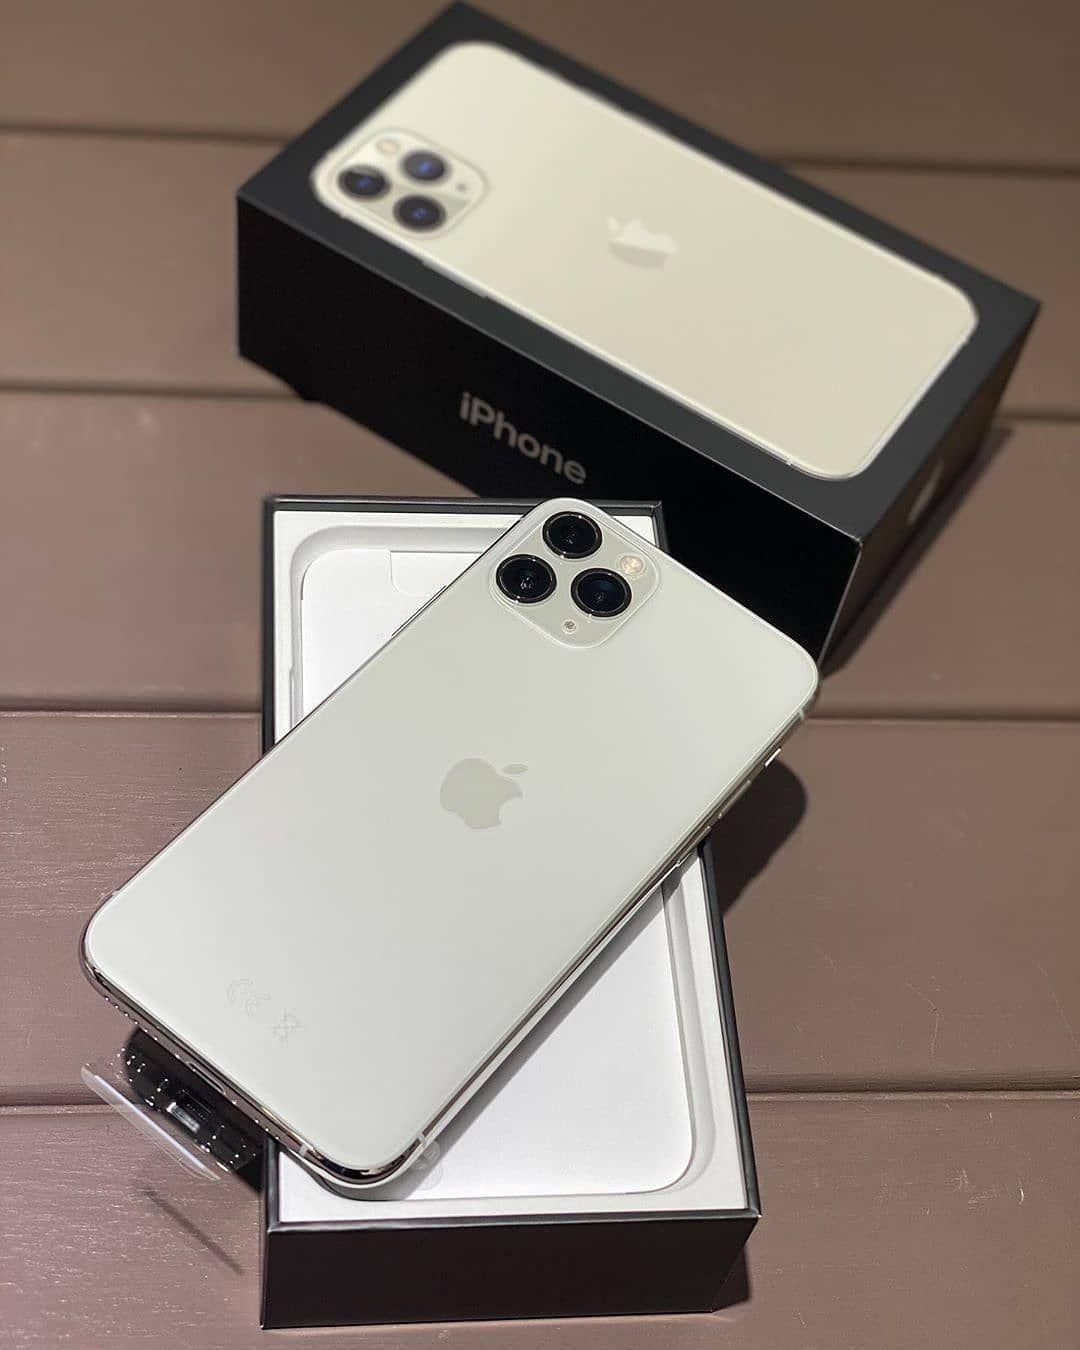 Iphone 11 Pro Apple Iphone Accessories Iphone Iphone Phone Cases